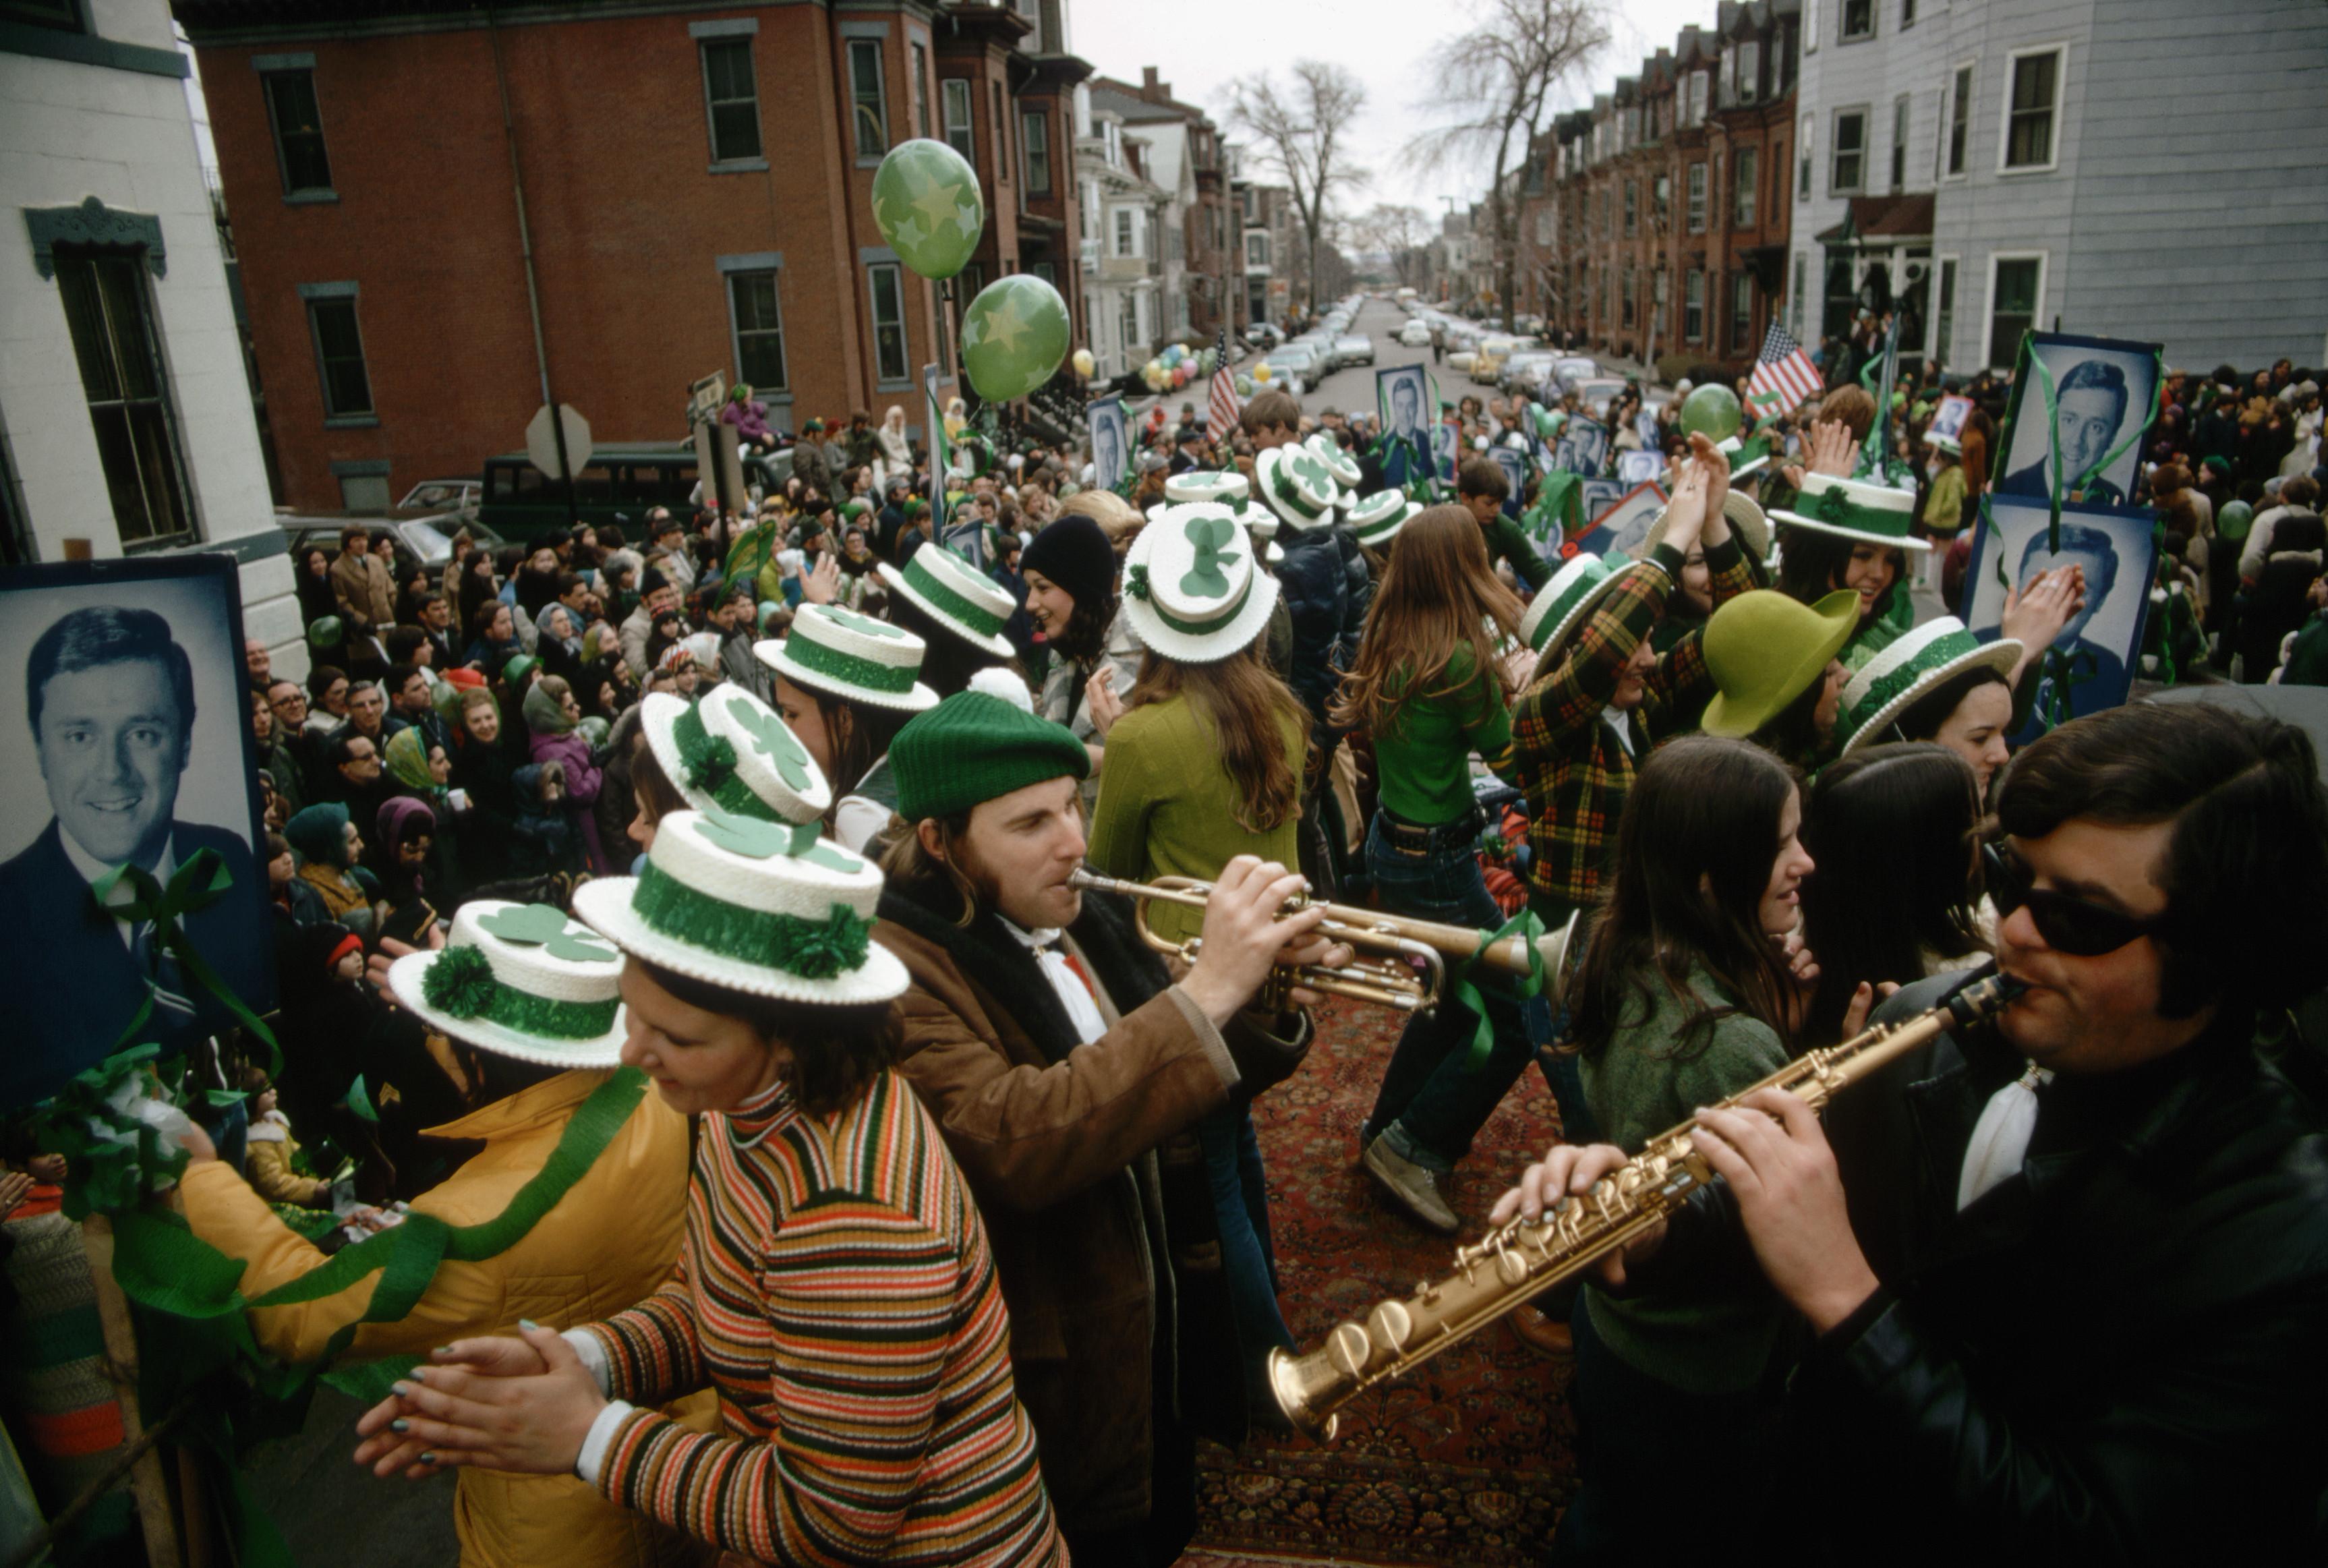 St. Patrick's Day Myths Debunked